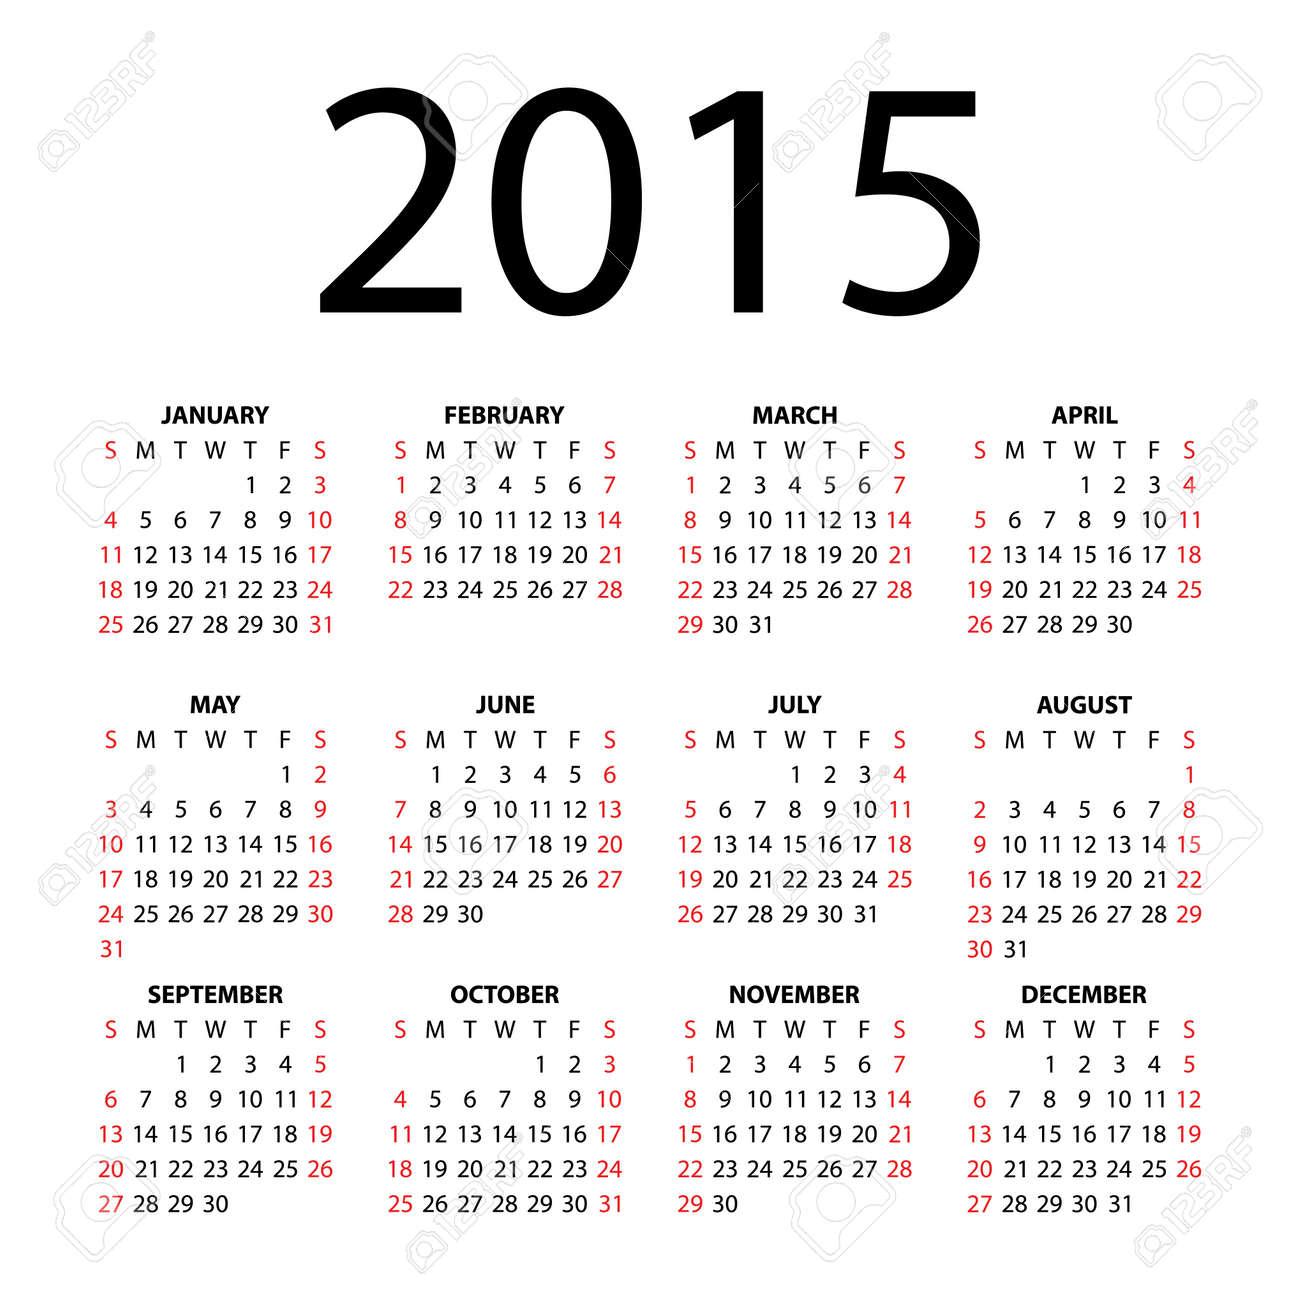 Calendar for 2015 - 23859619